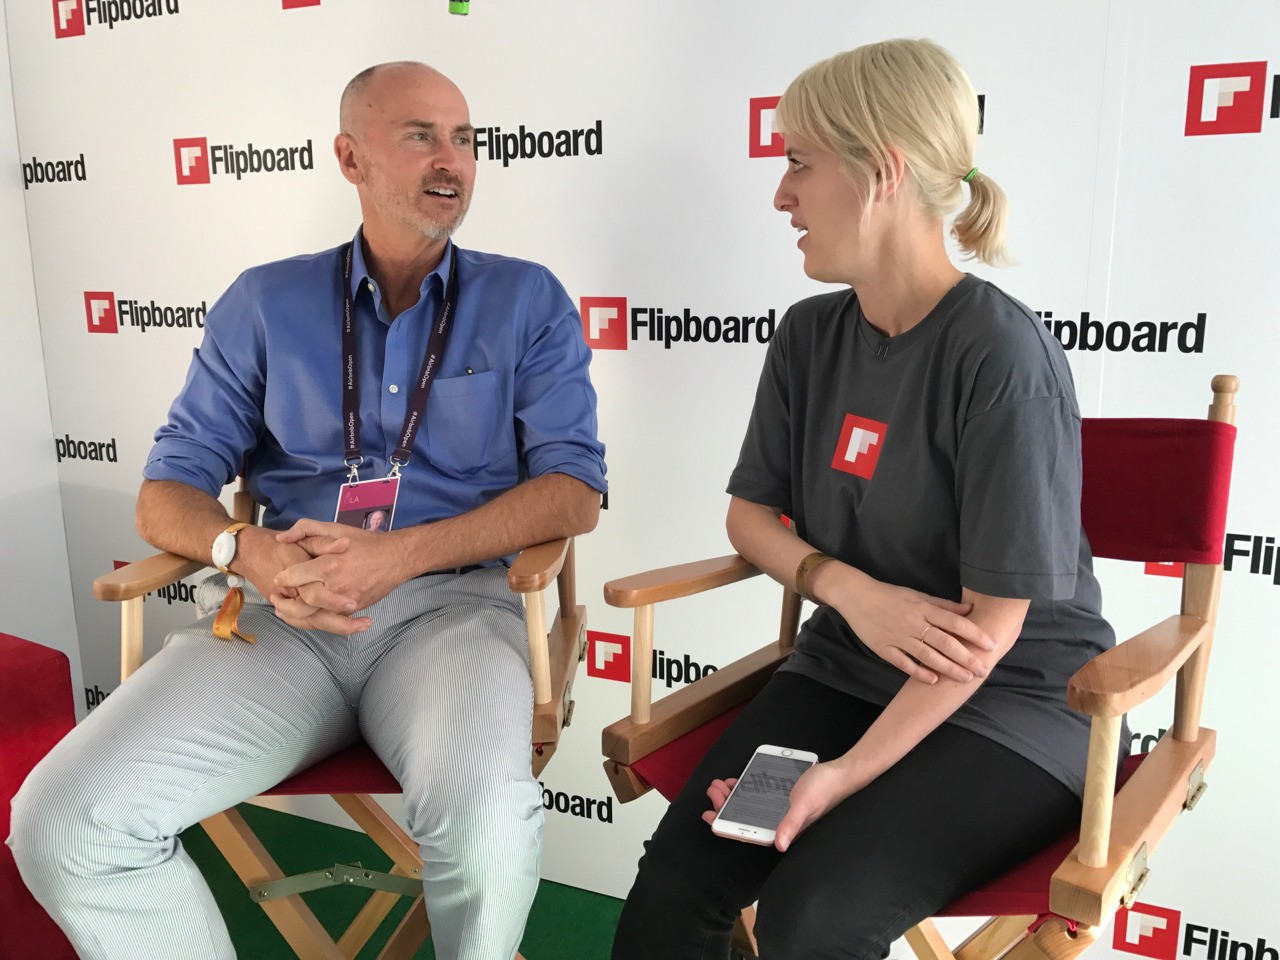 Mia is interviewen Chip Conley